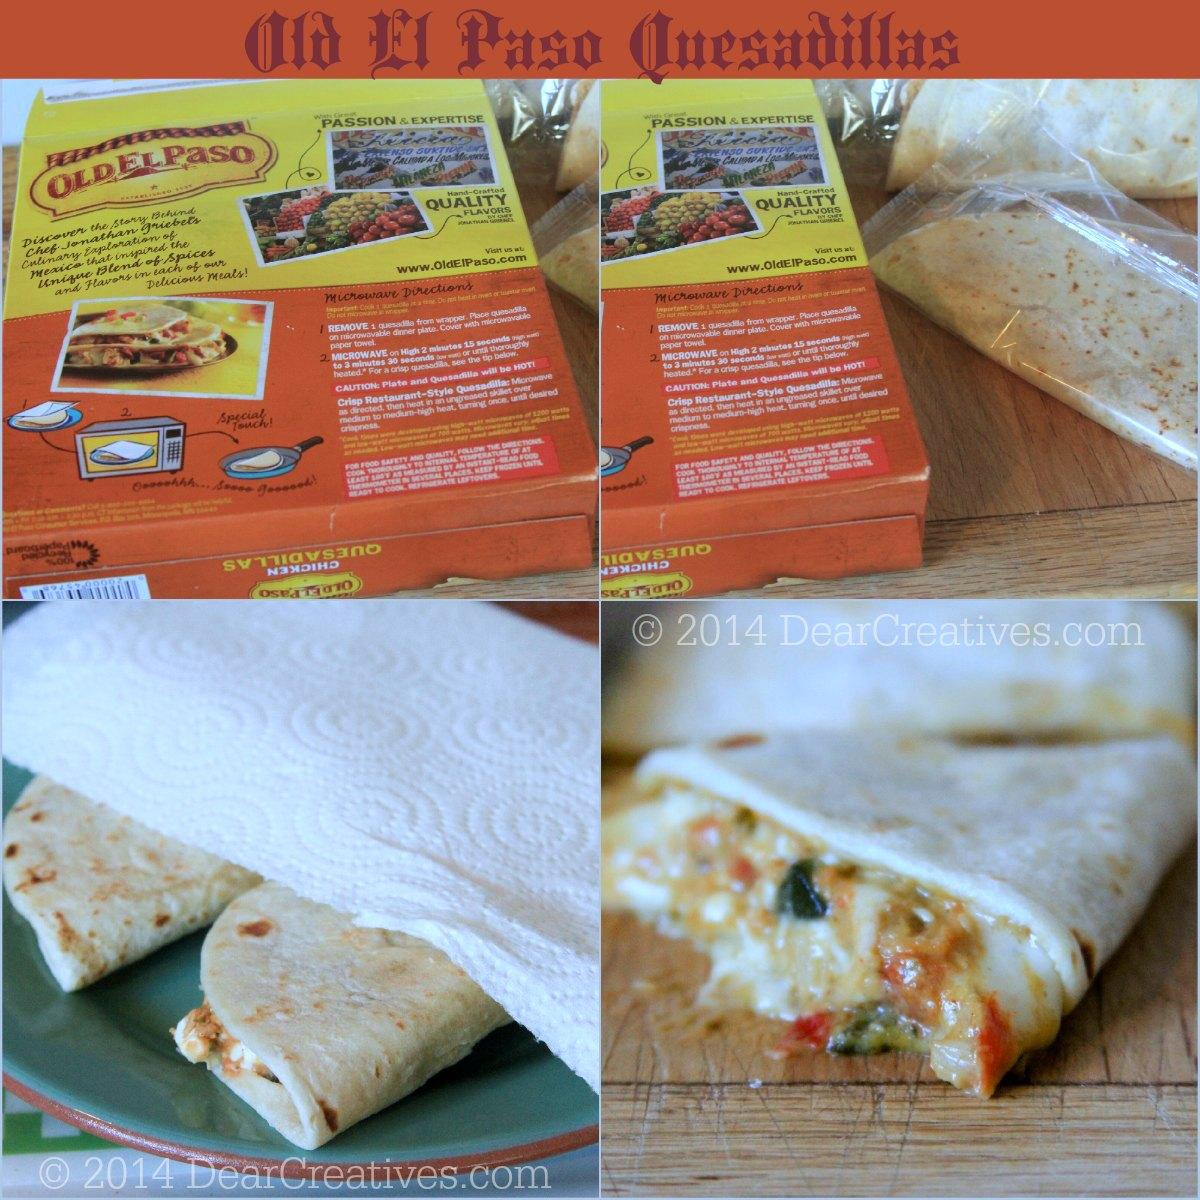 Old El Paso Quesadillas _Step by Step_